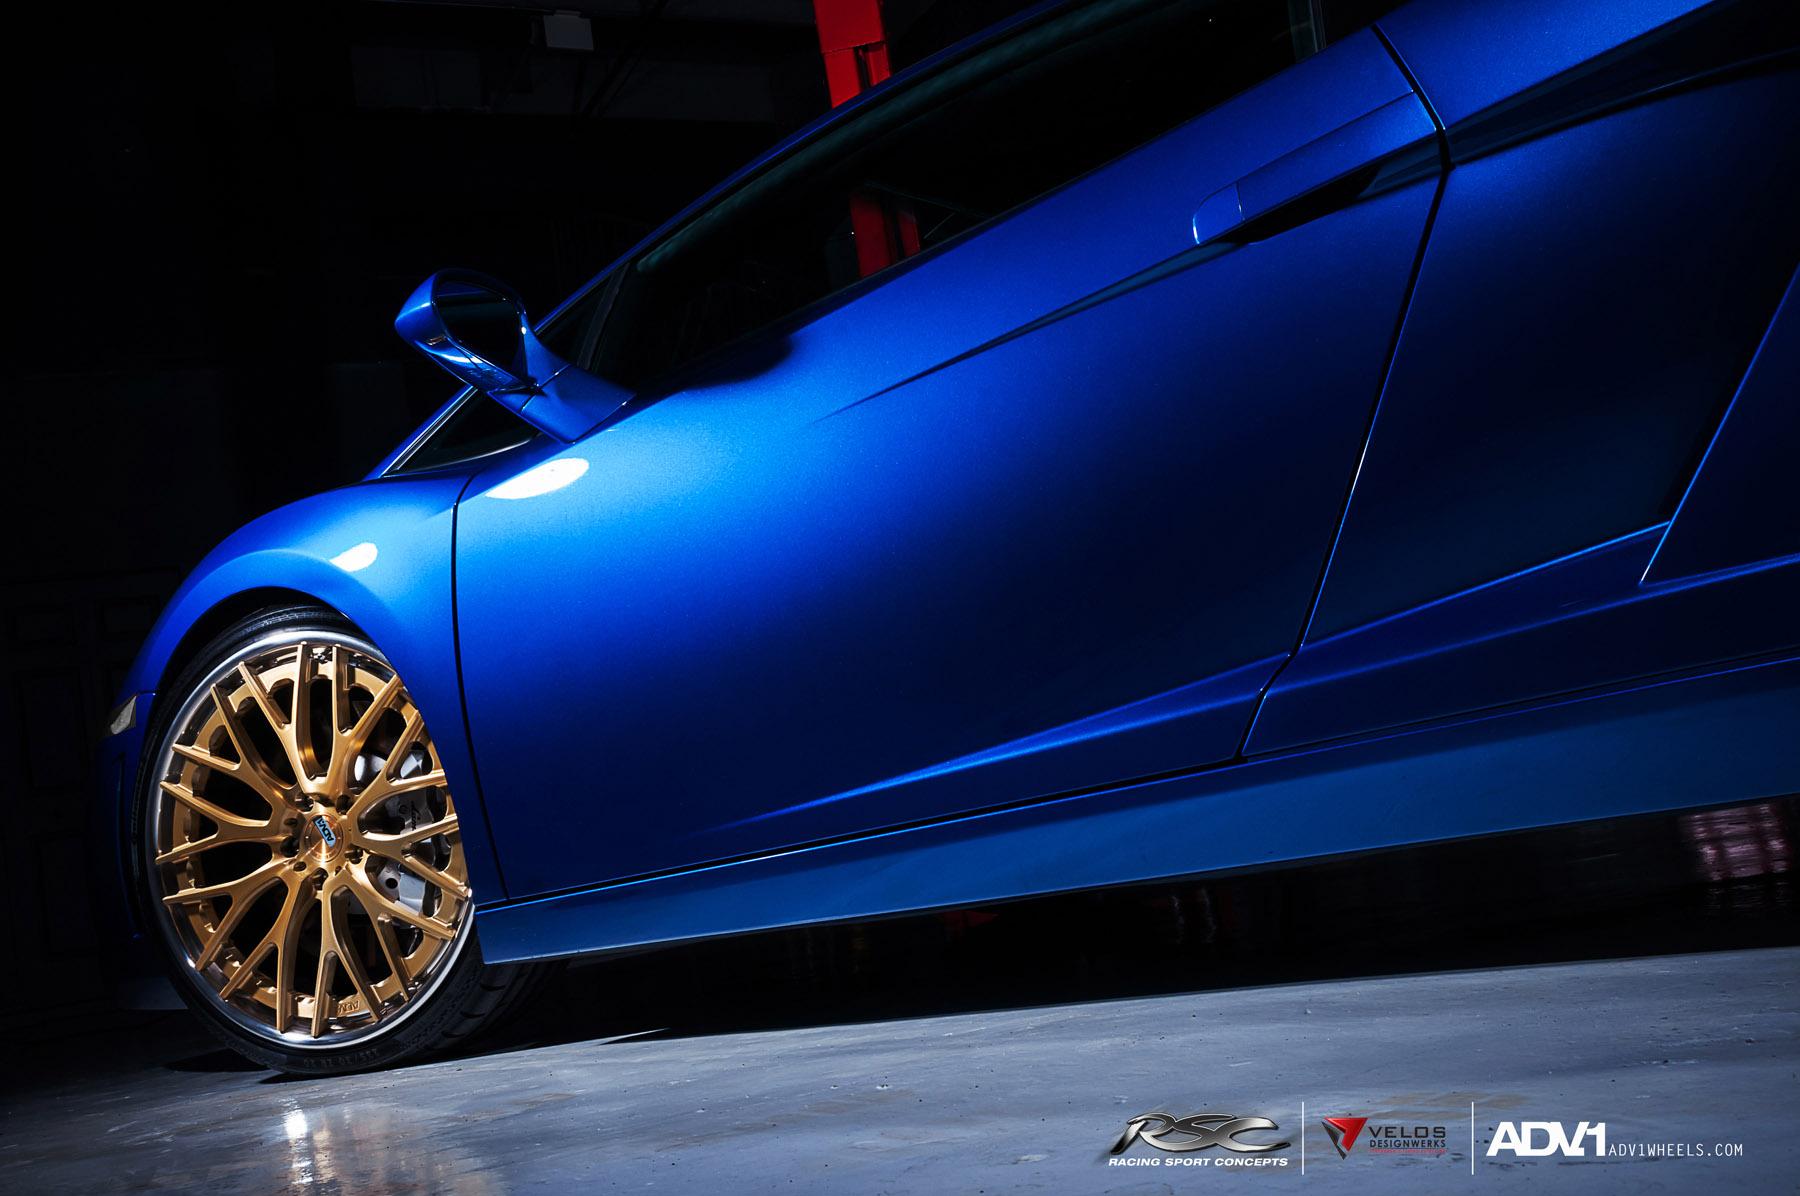 ADV.1 колеса Lamborghini Gallardo ADV10.0TS SL Gold Edition  - фотография №9